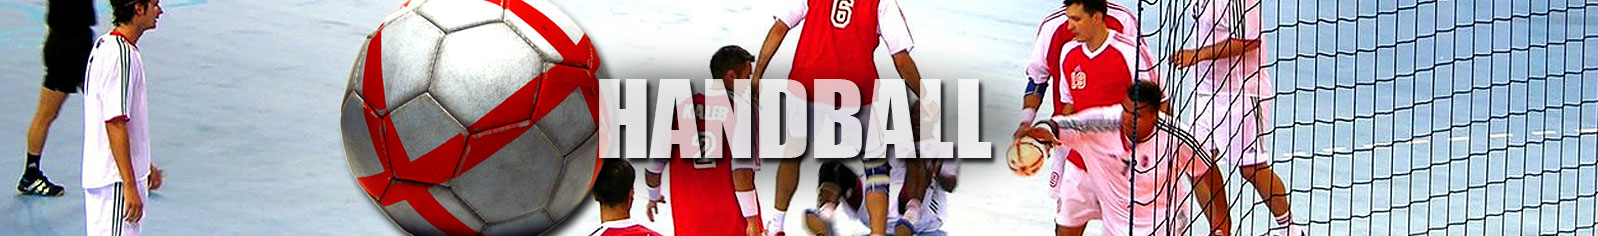 maillot hand handball personnalise jump performance